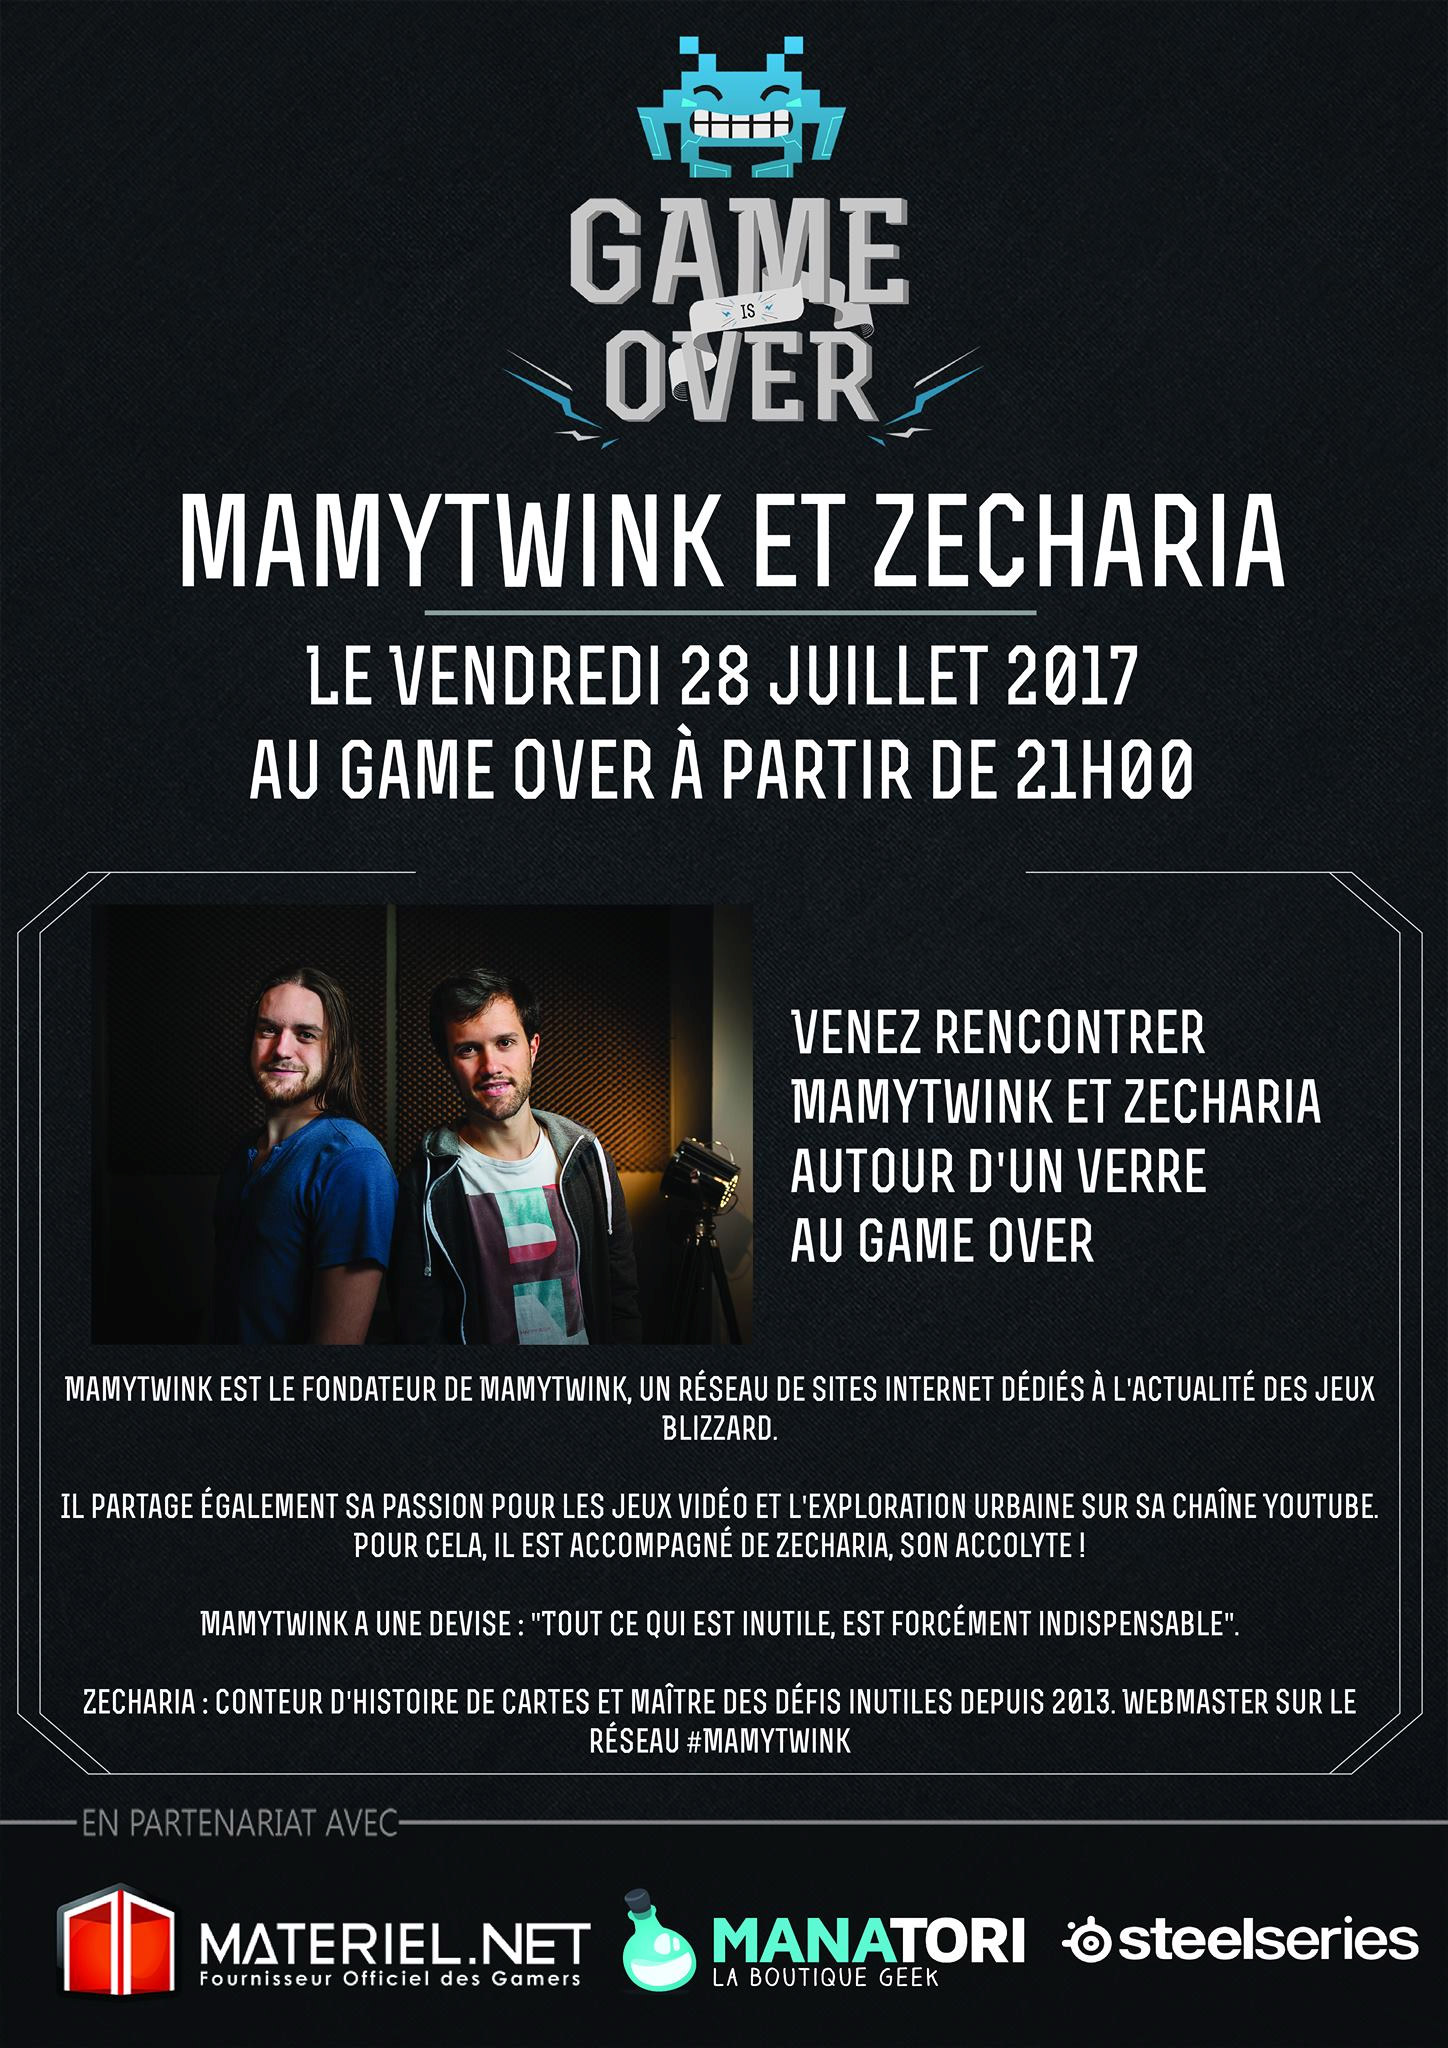 Mamytwink et Zecharia au bar Game Over de Nantes ce vendredi 28 juillet